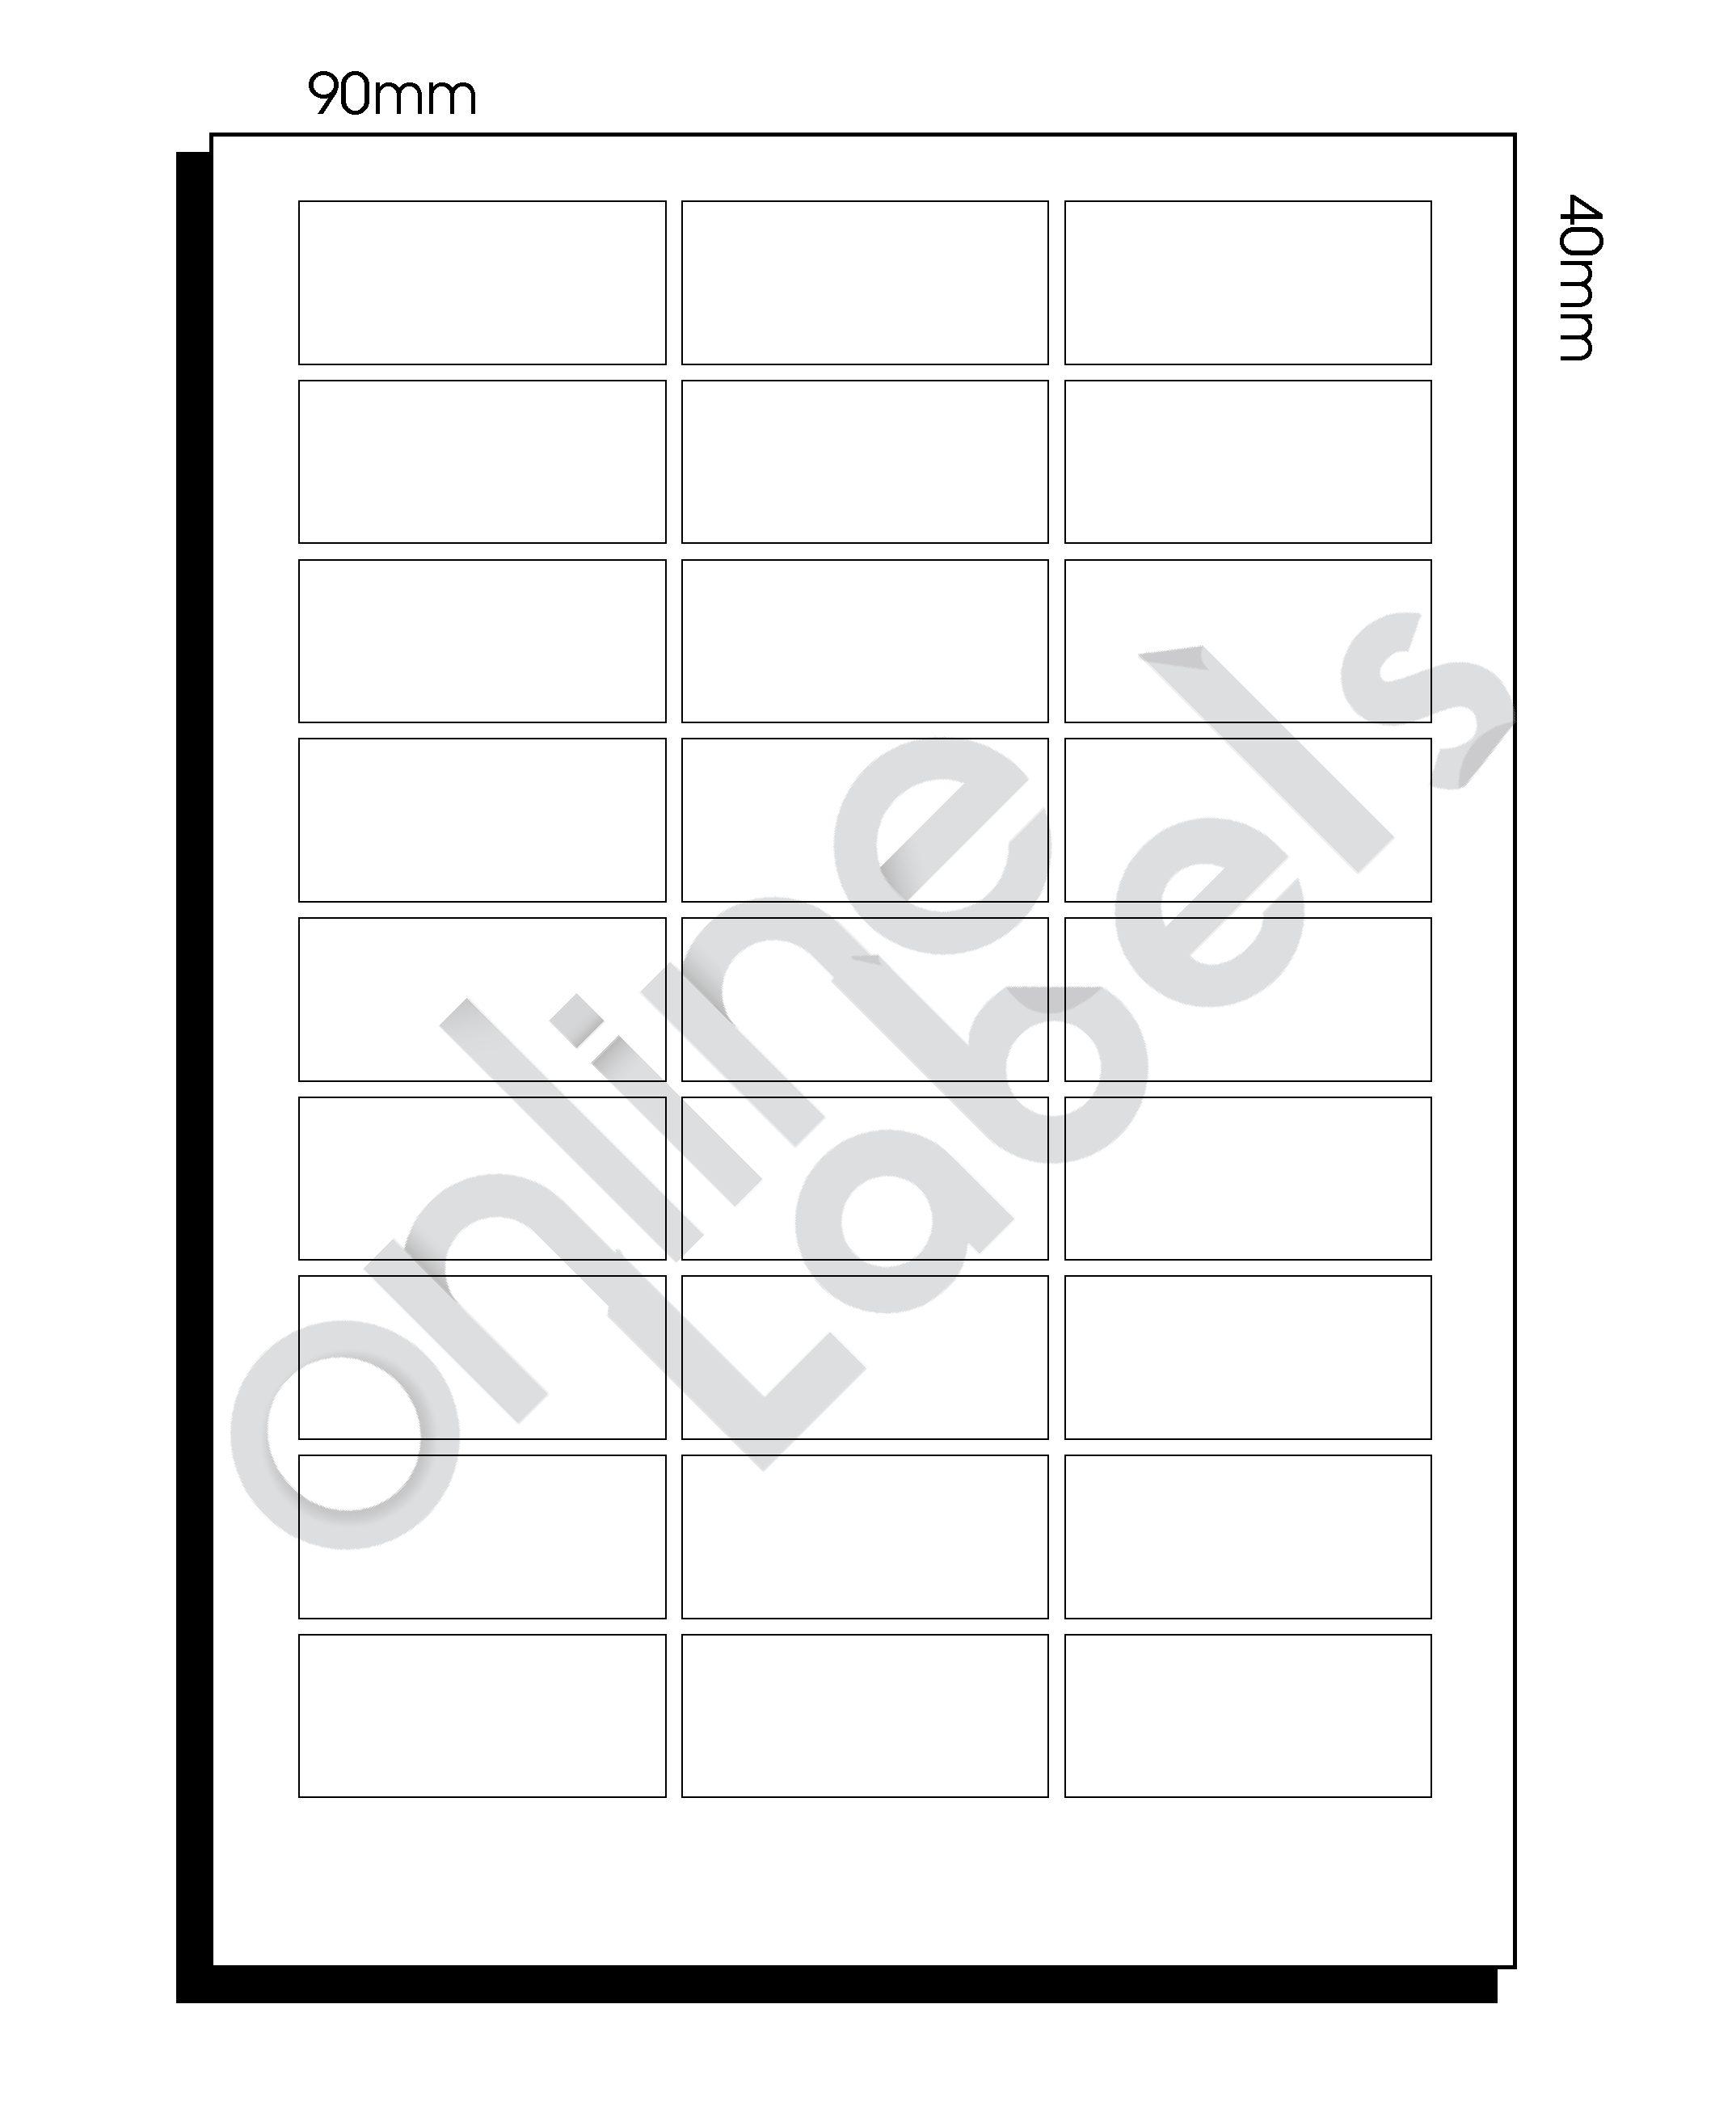 SR-A3 Diecut Labels – 90mm x 40mm